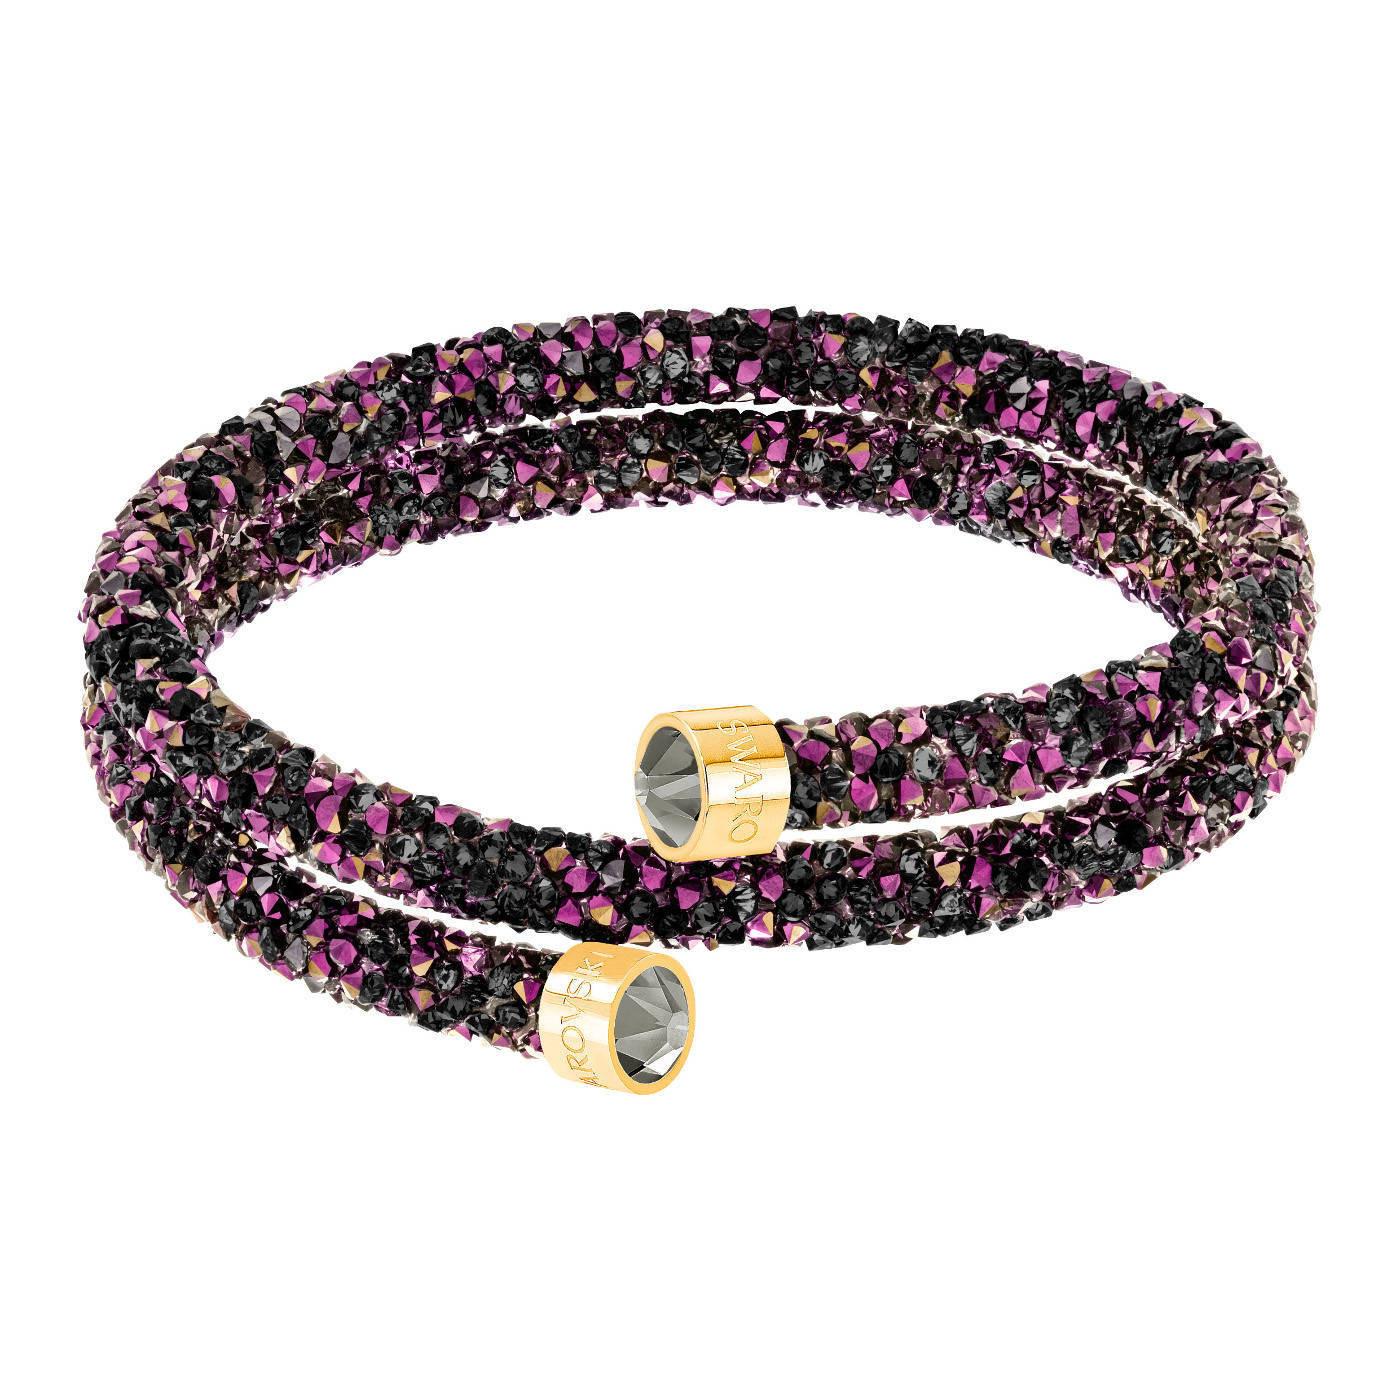 Swarovski Crystaldust Armband swarovski-crystaldust-astral-pink ... 1e0e0bd70f9e9